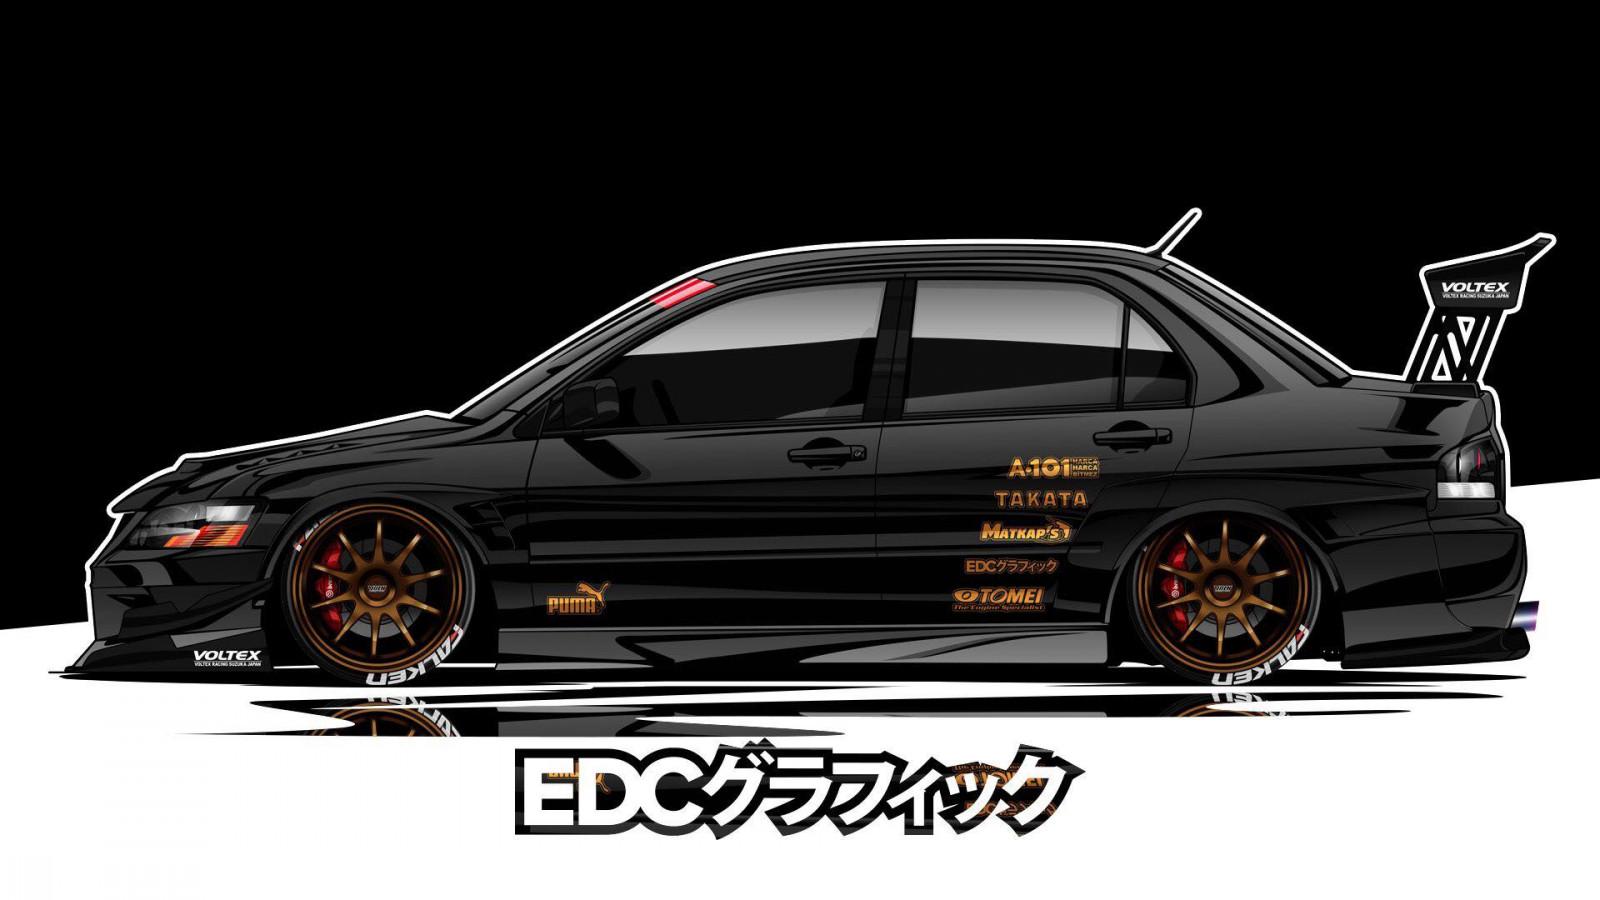 Wallpaper : EDC Graphics, Mitsubishi Lancer Evolution, JDM ...